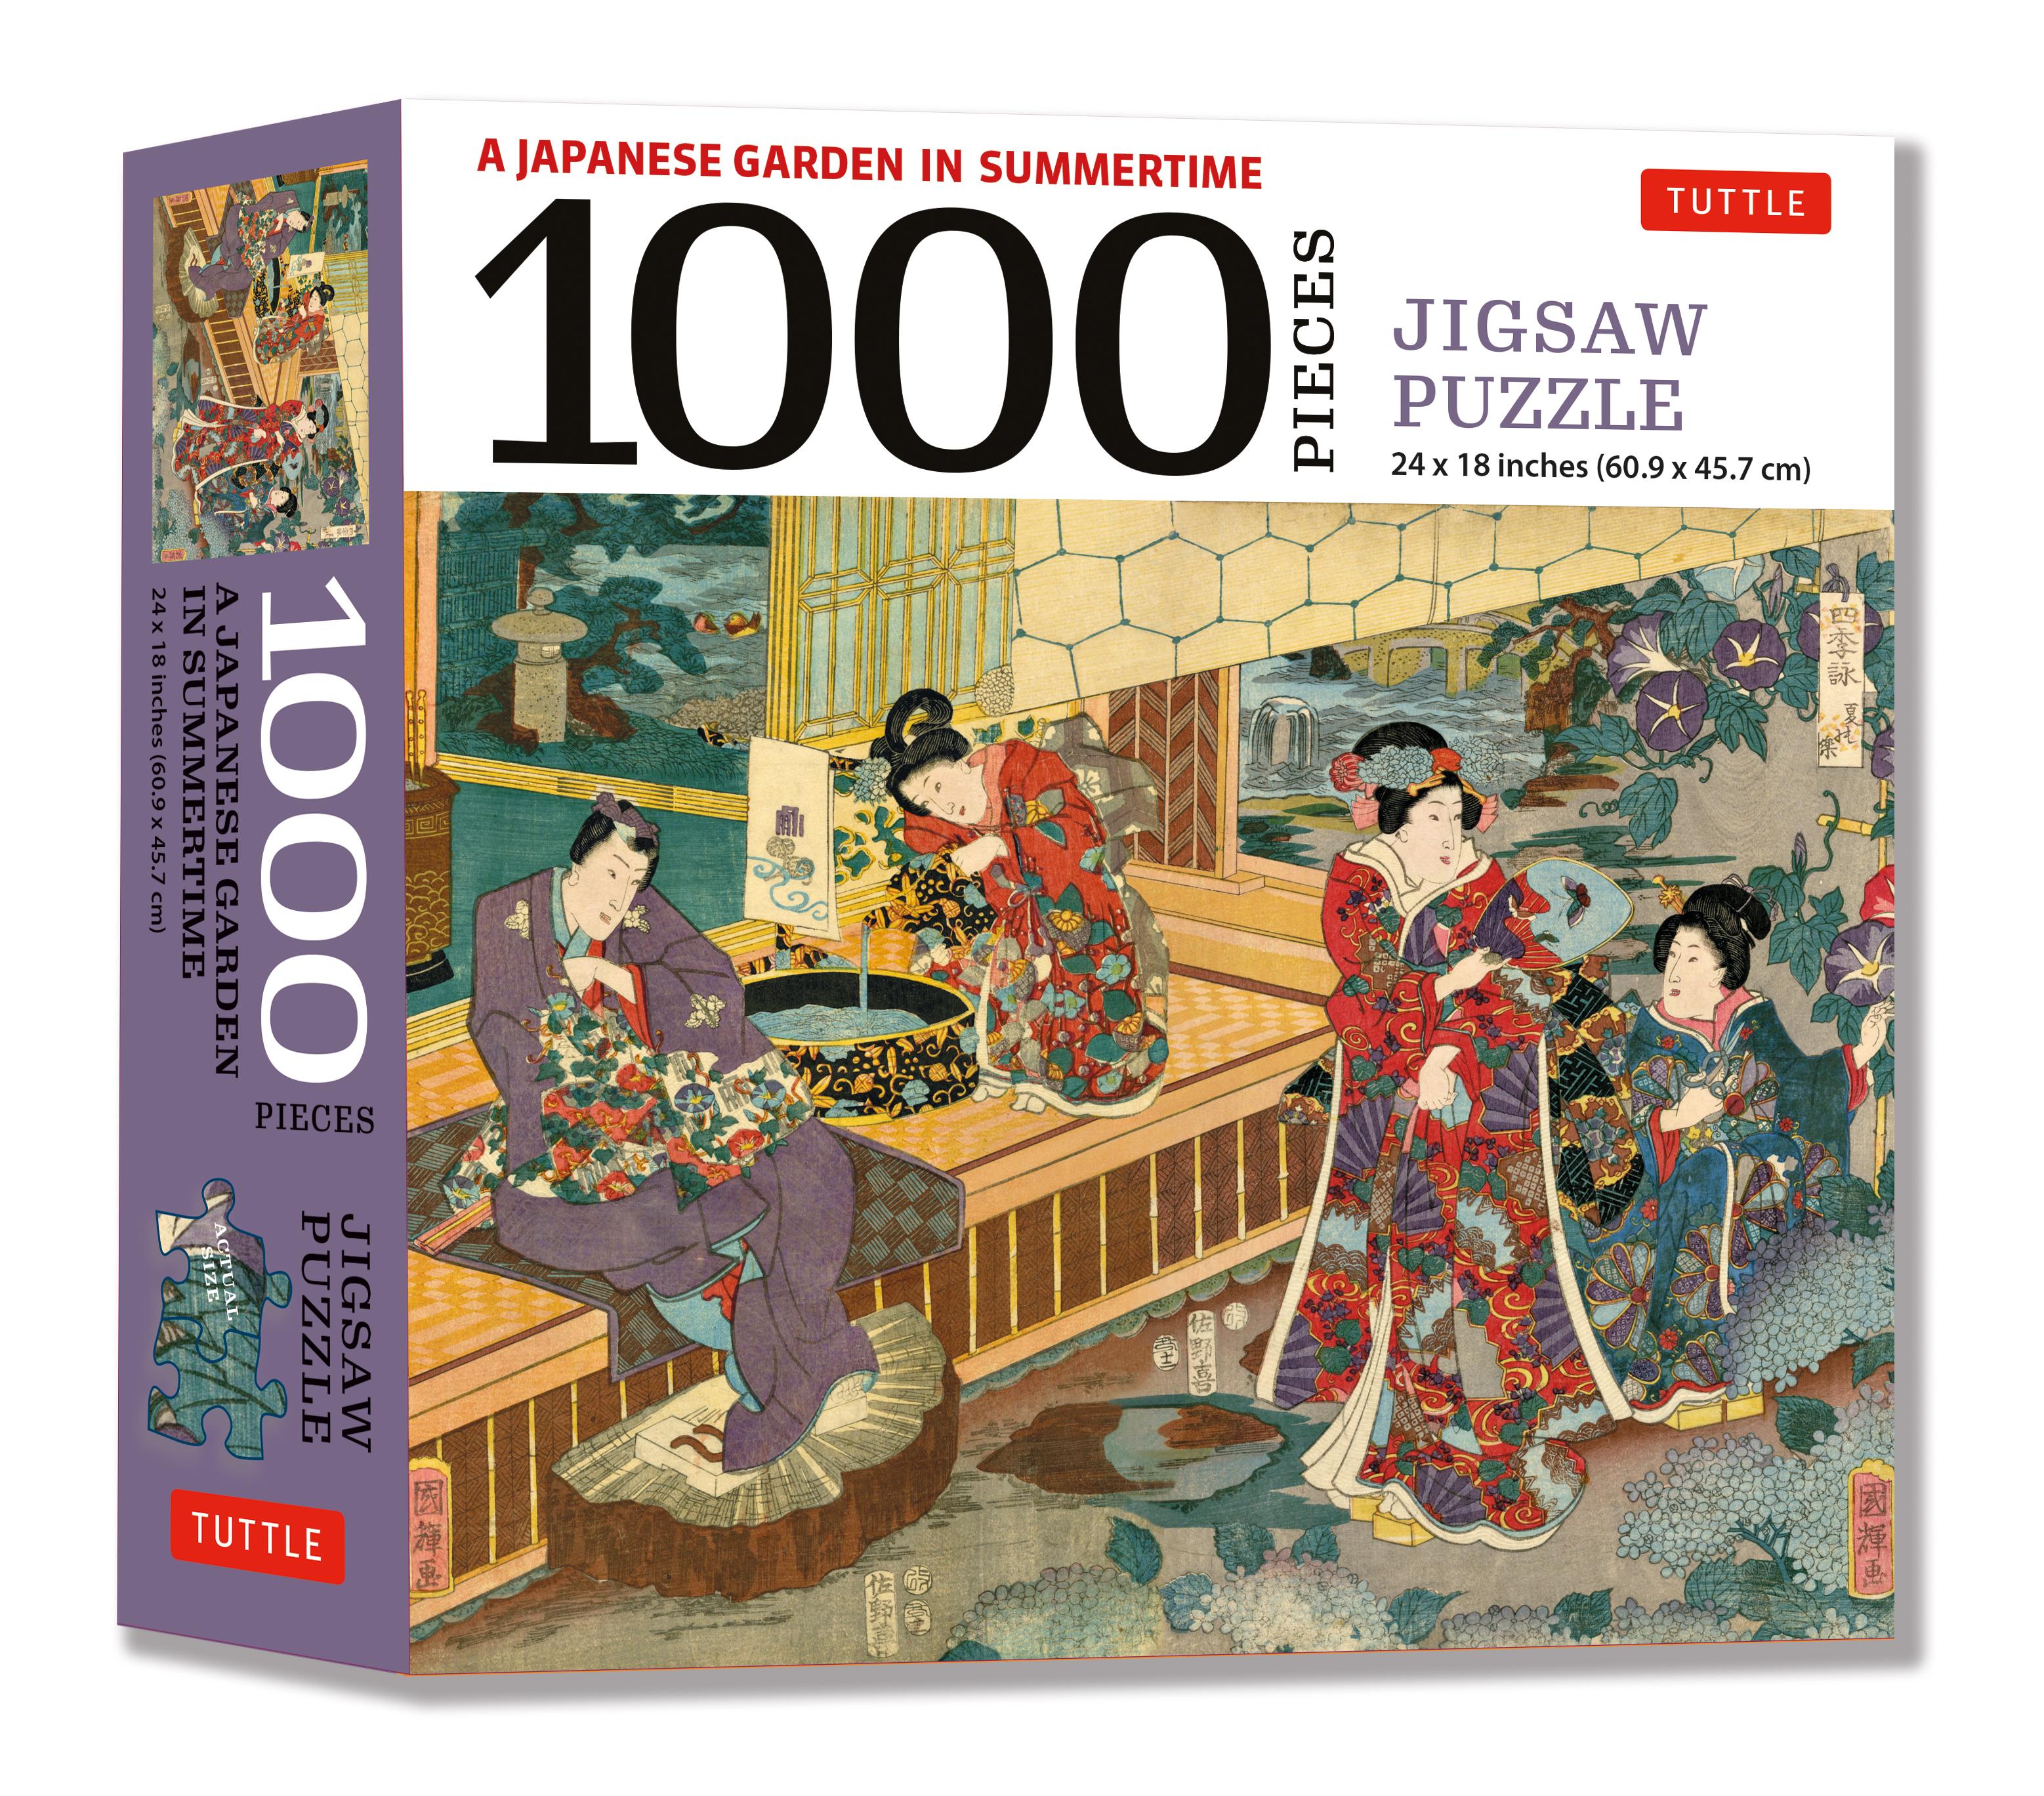 A Japanese Garden in Summertime - 1000 Piece Jigsaw Puzzle